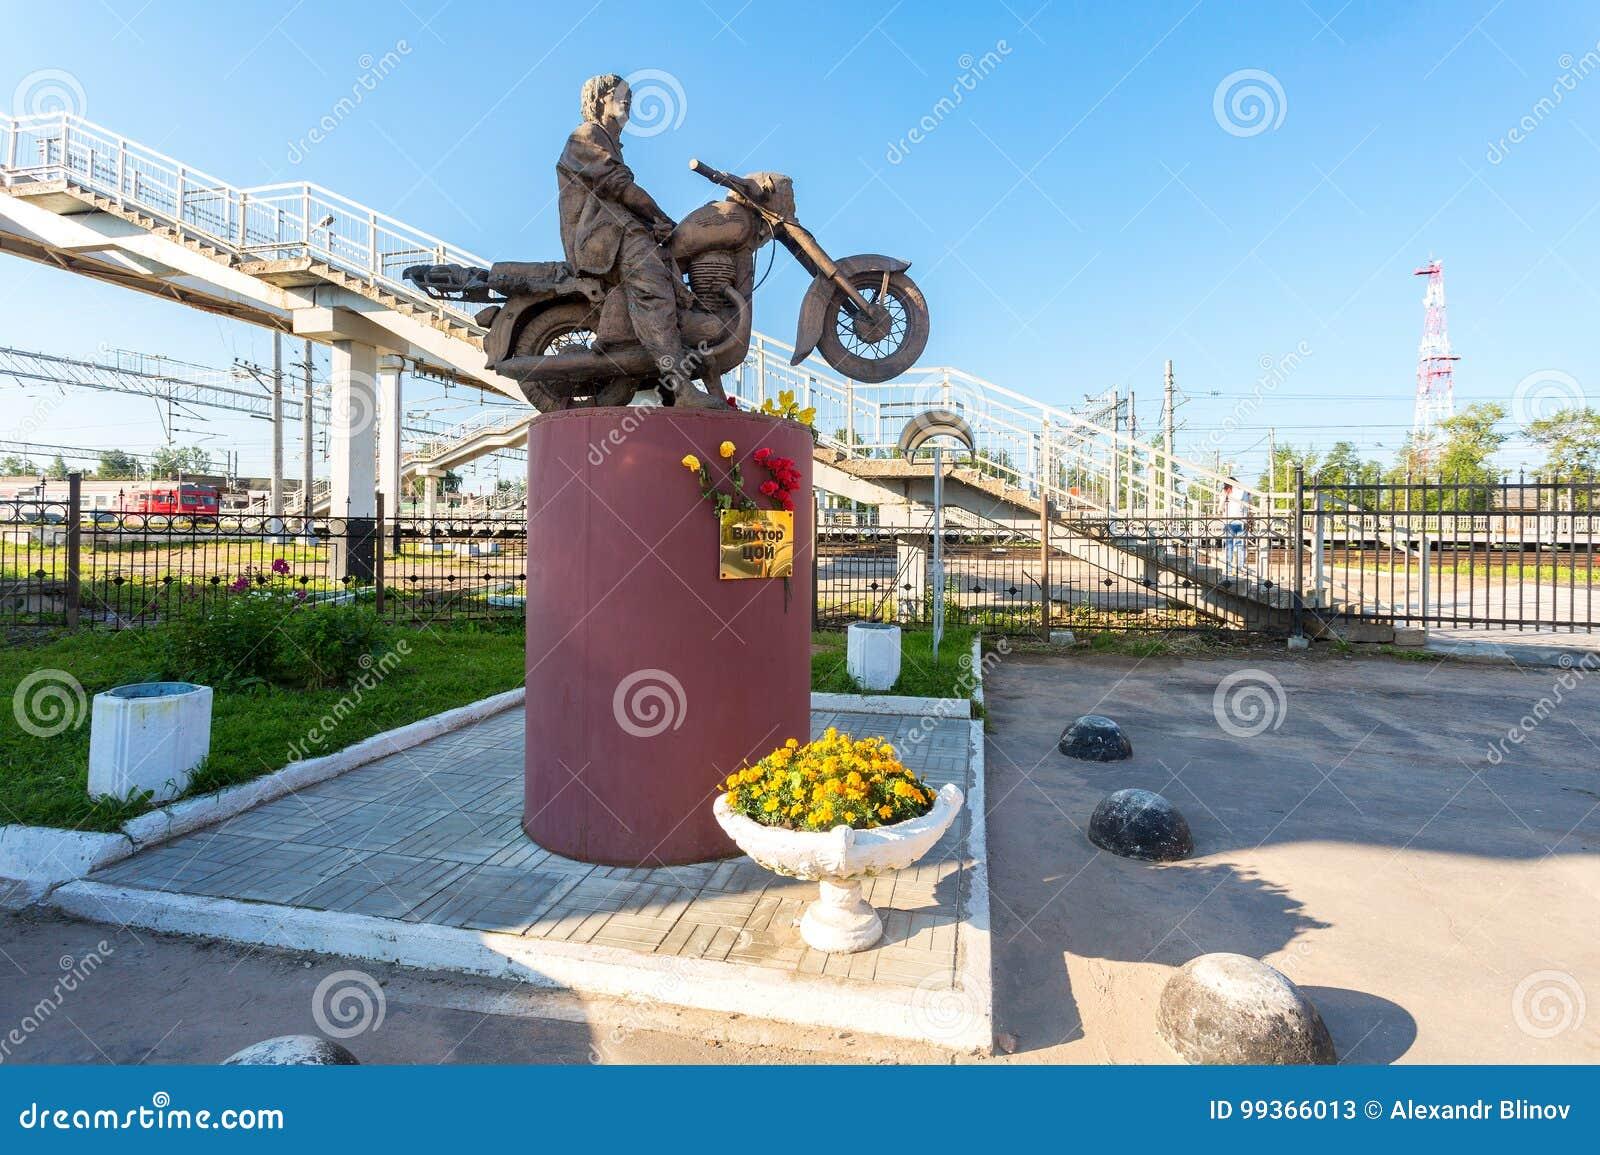 Monument to Viktor Tsoi will go to the Novgorod region 09/29/2015 69